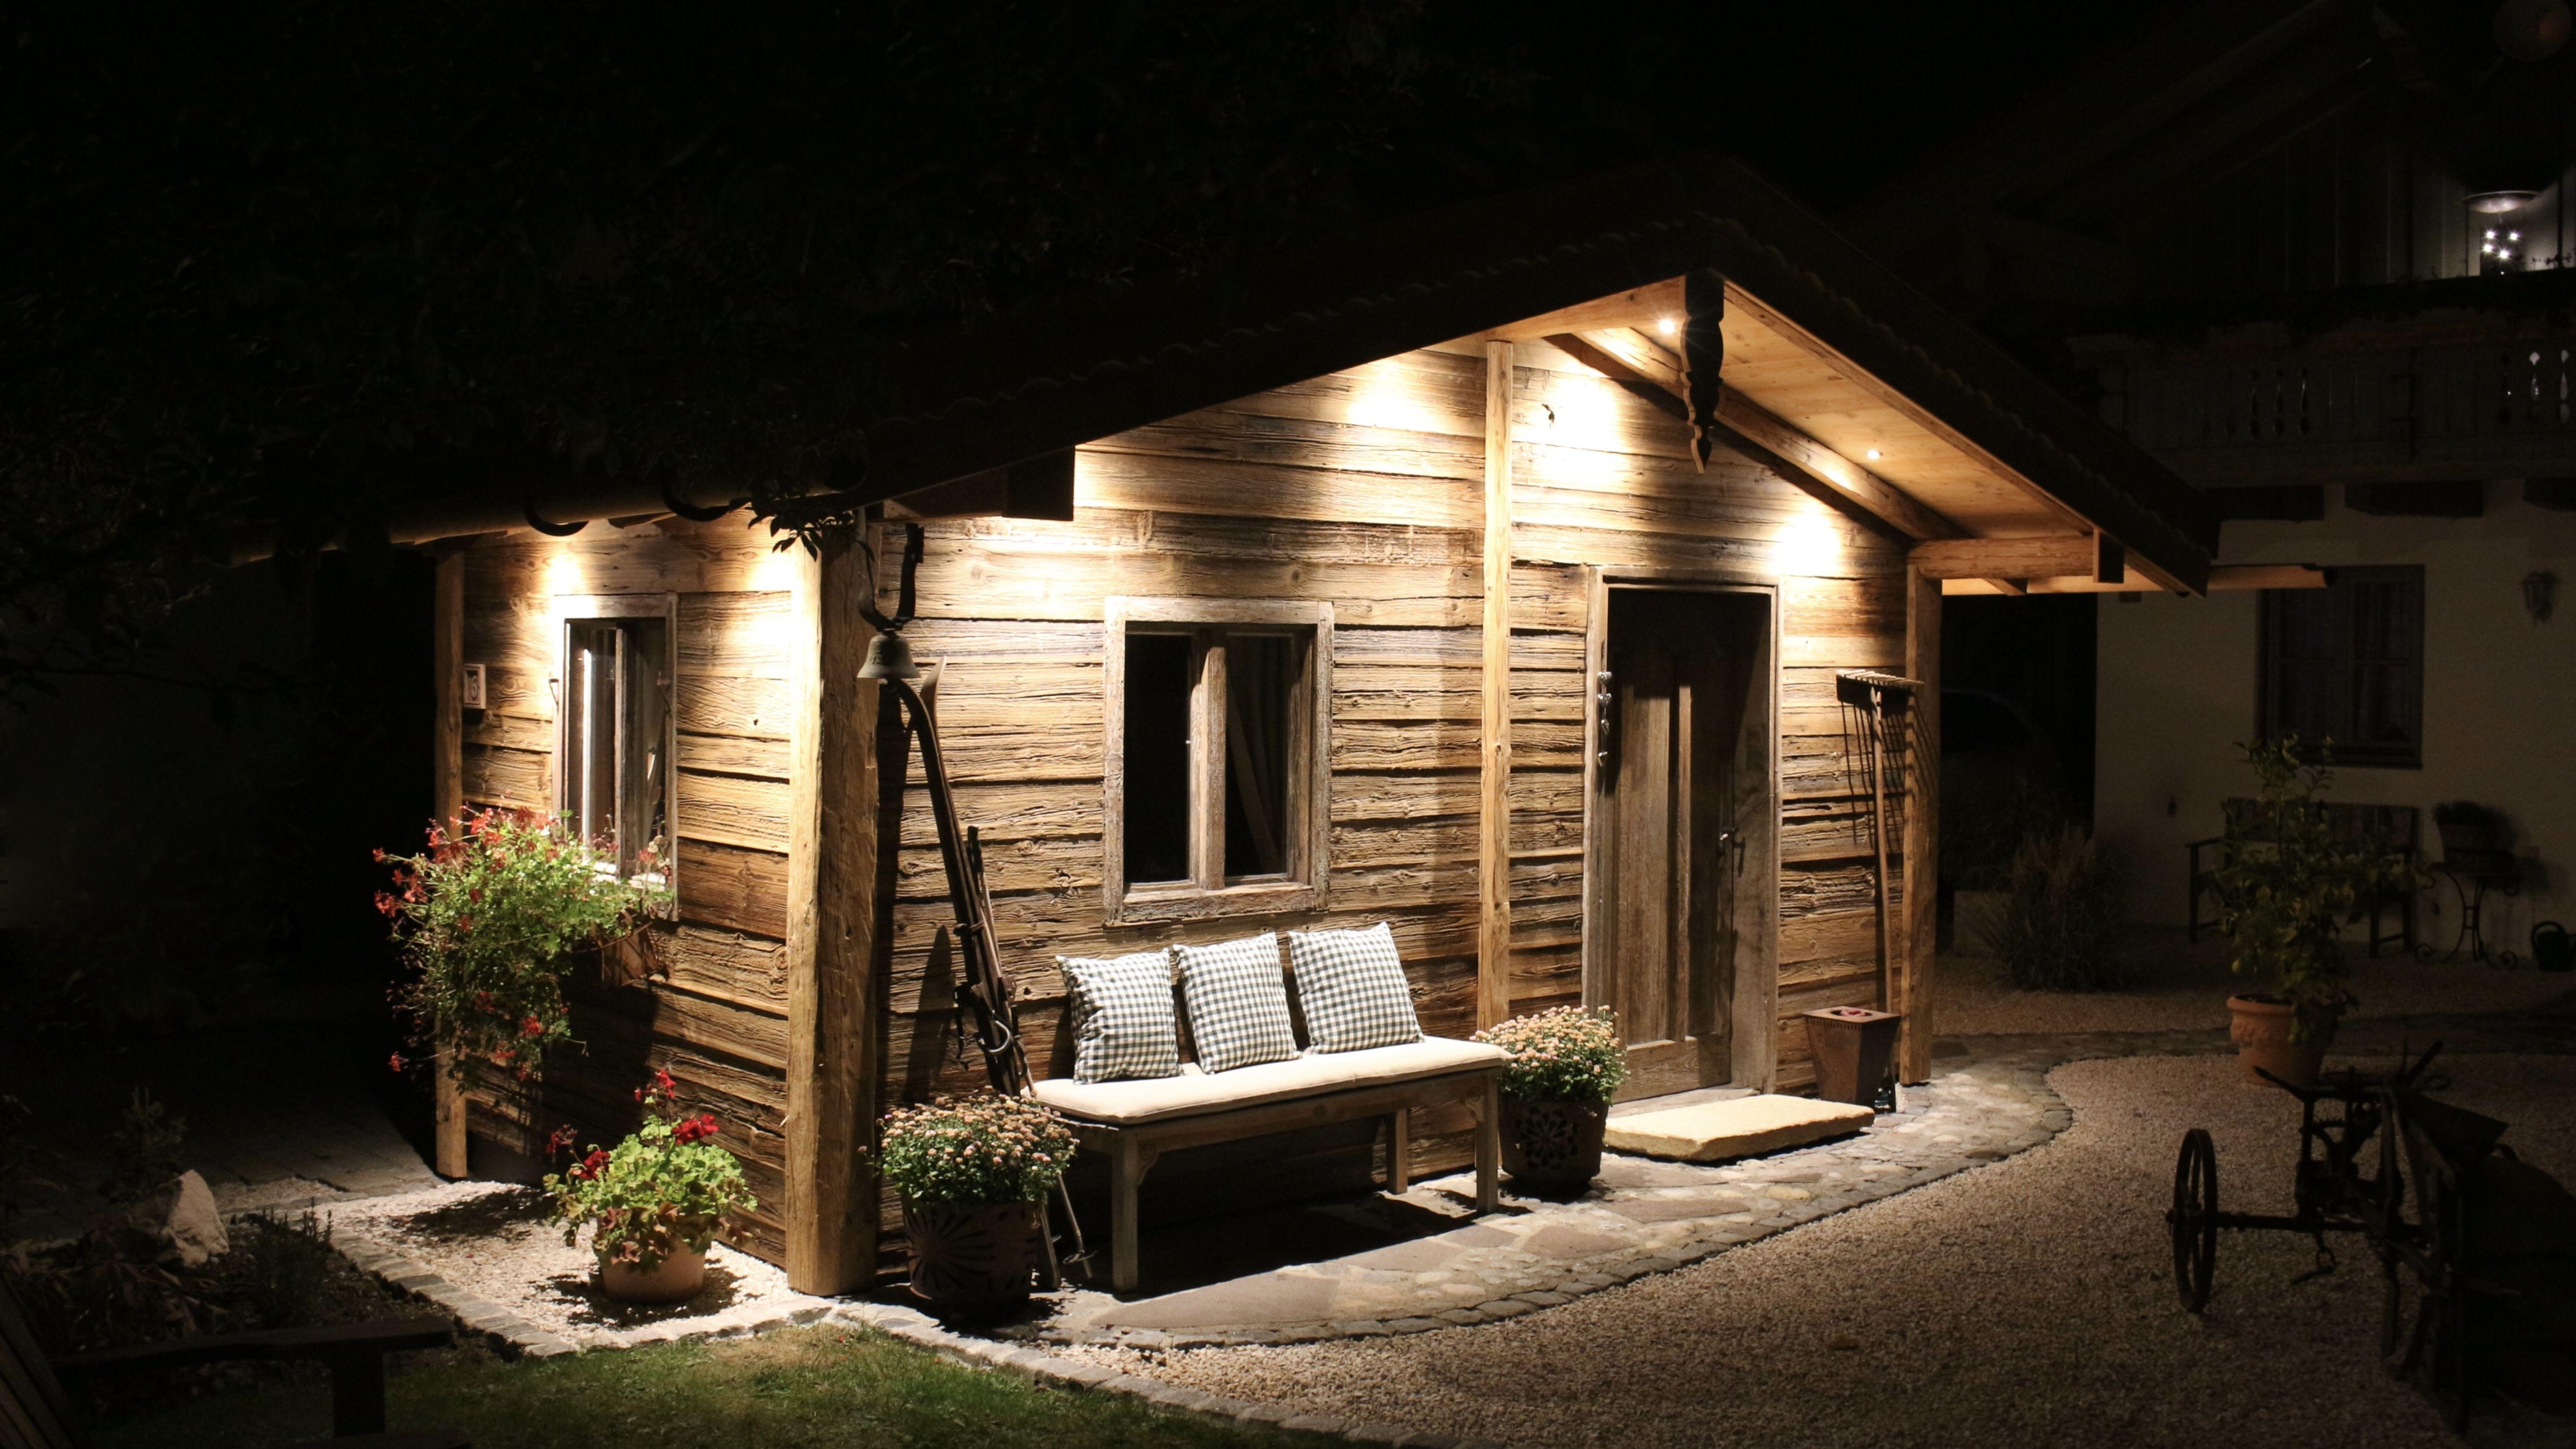 Alpen Chalet Uriger Charme Landhausdiele Gartenhutte Gartenhaus